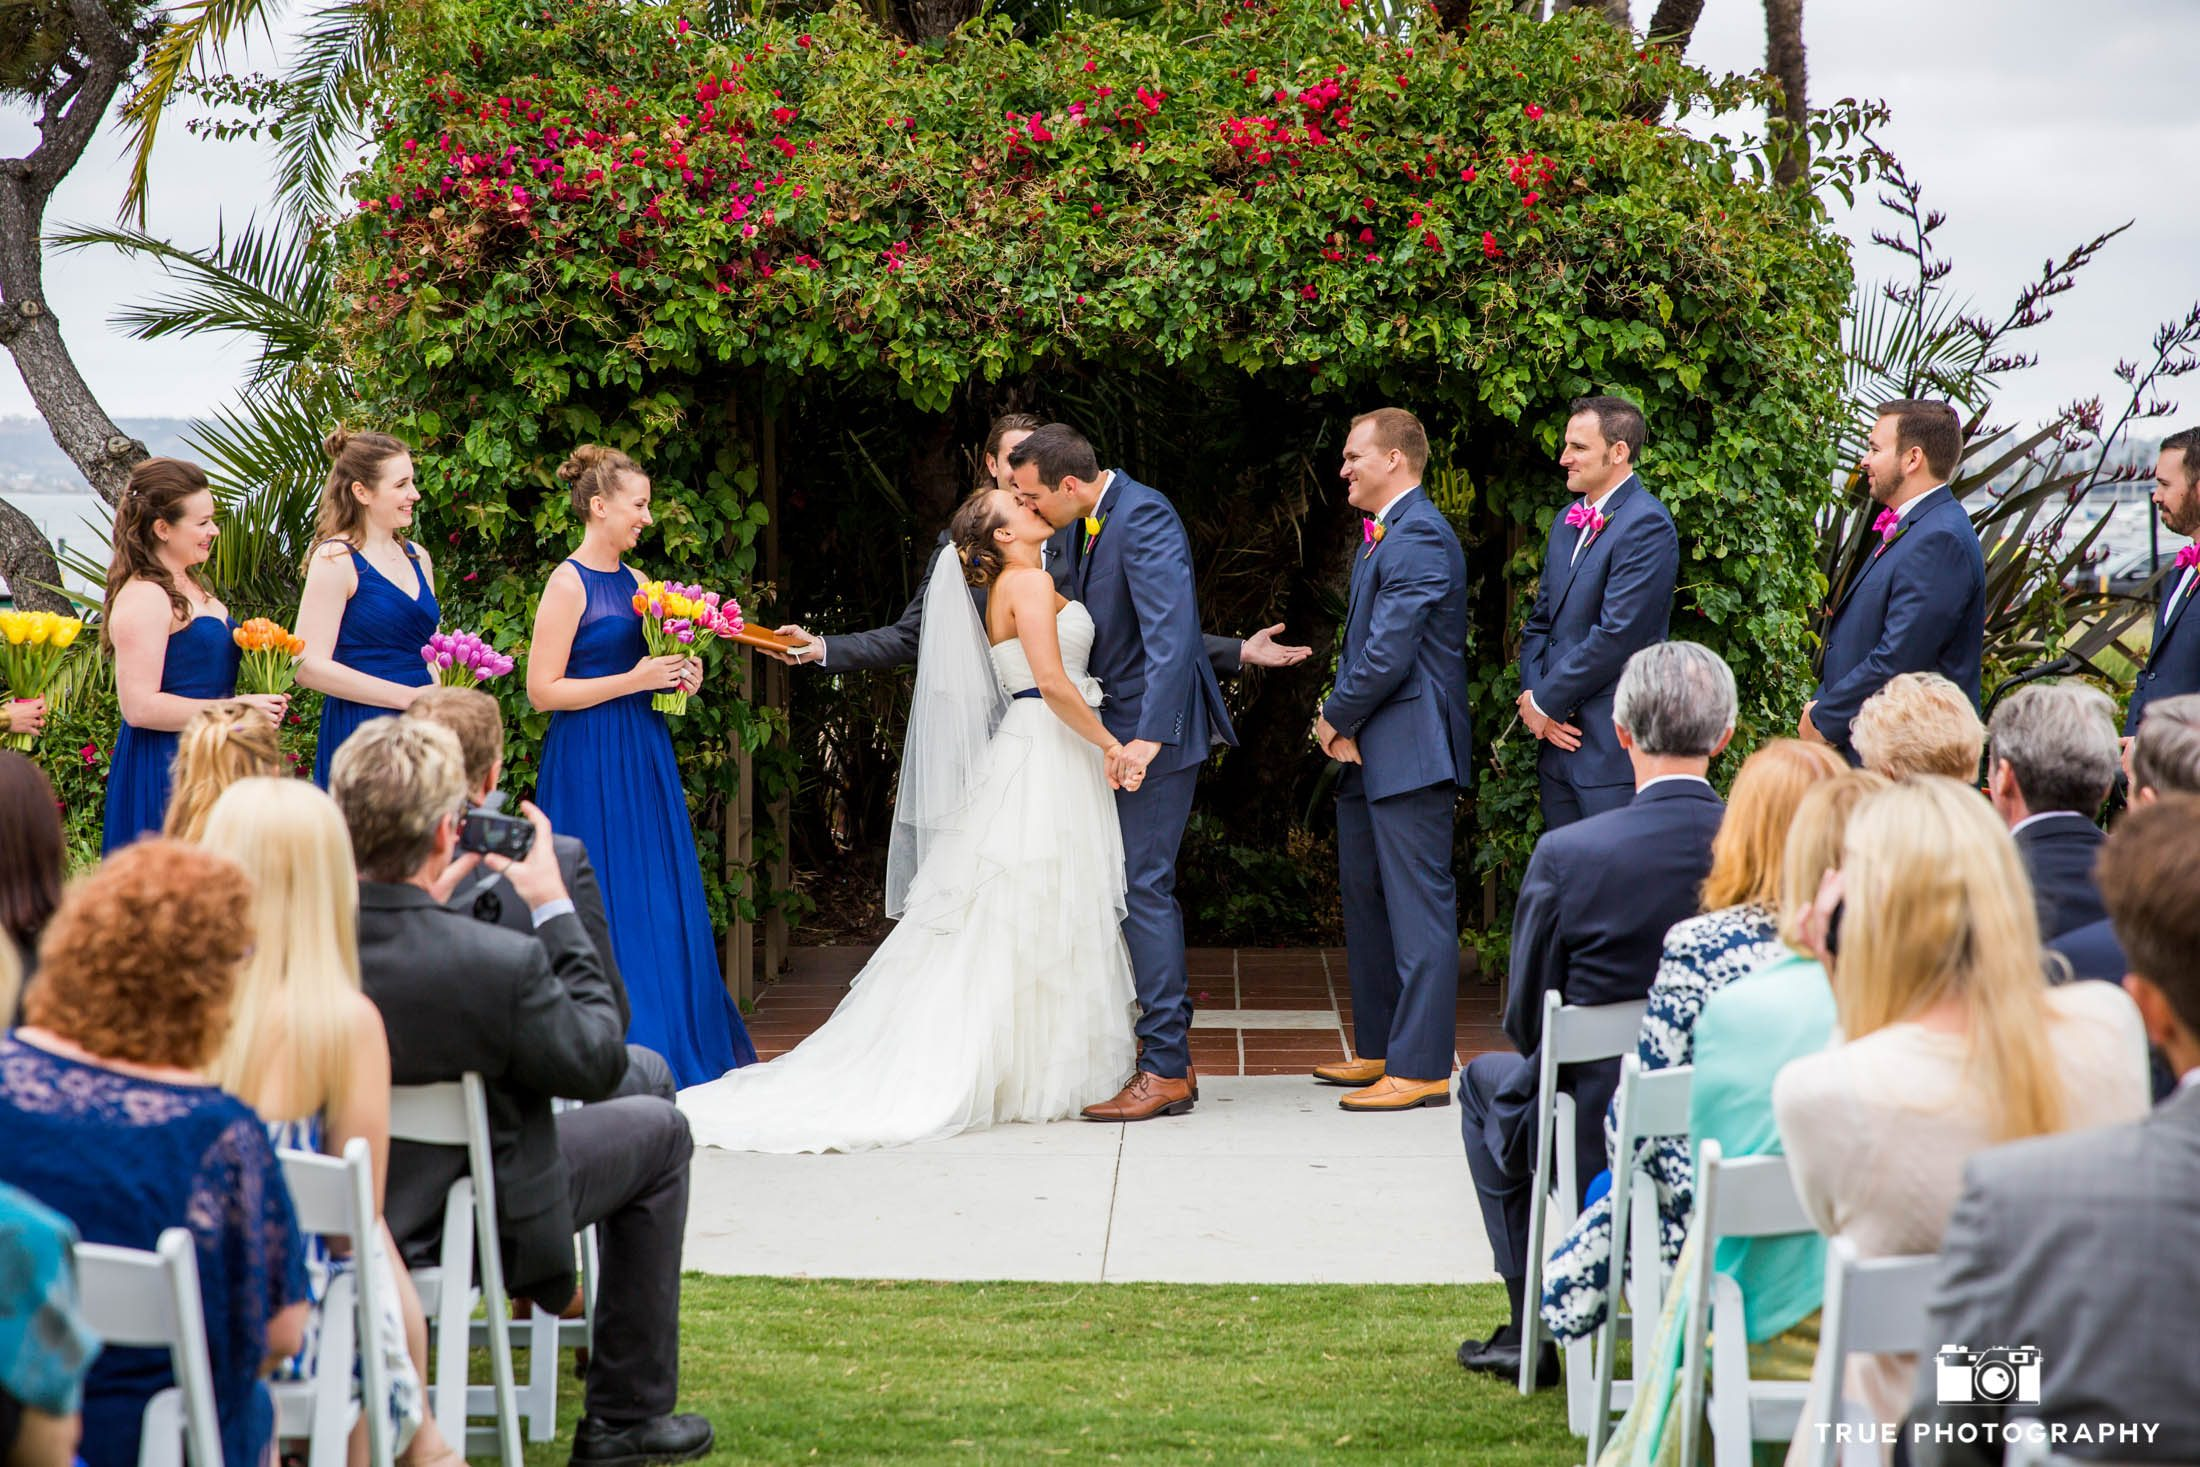 Kiss at the wedding arbor